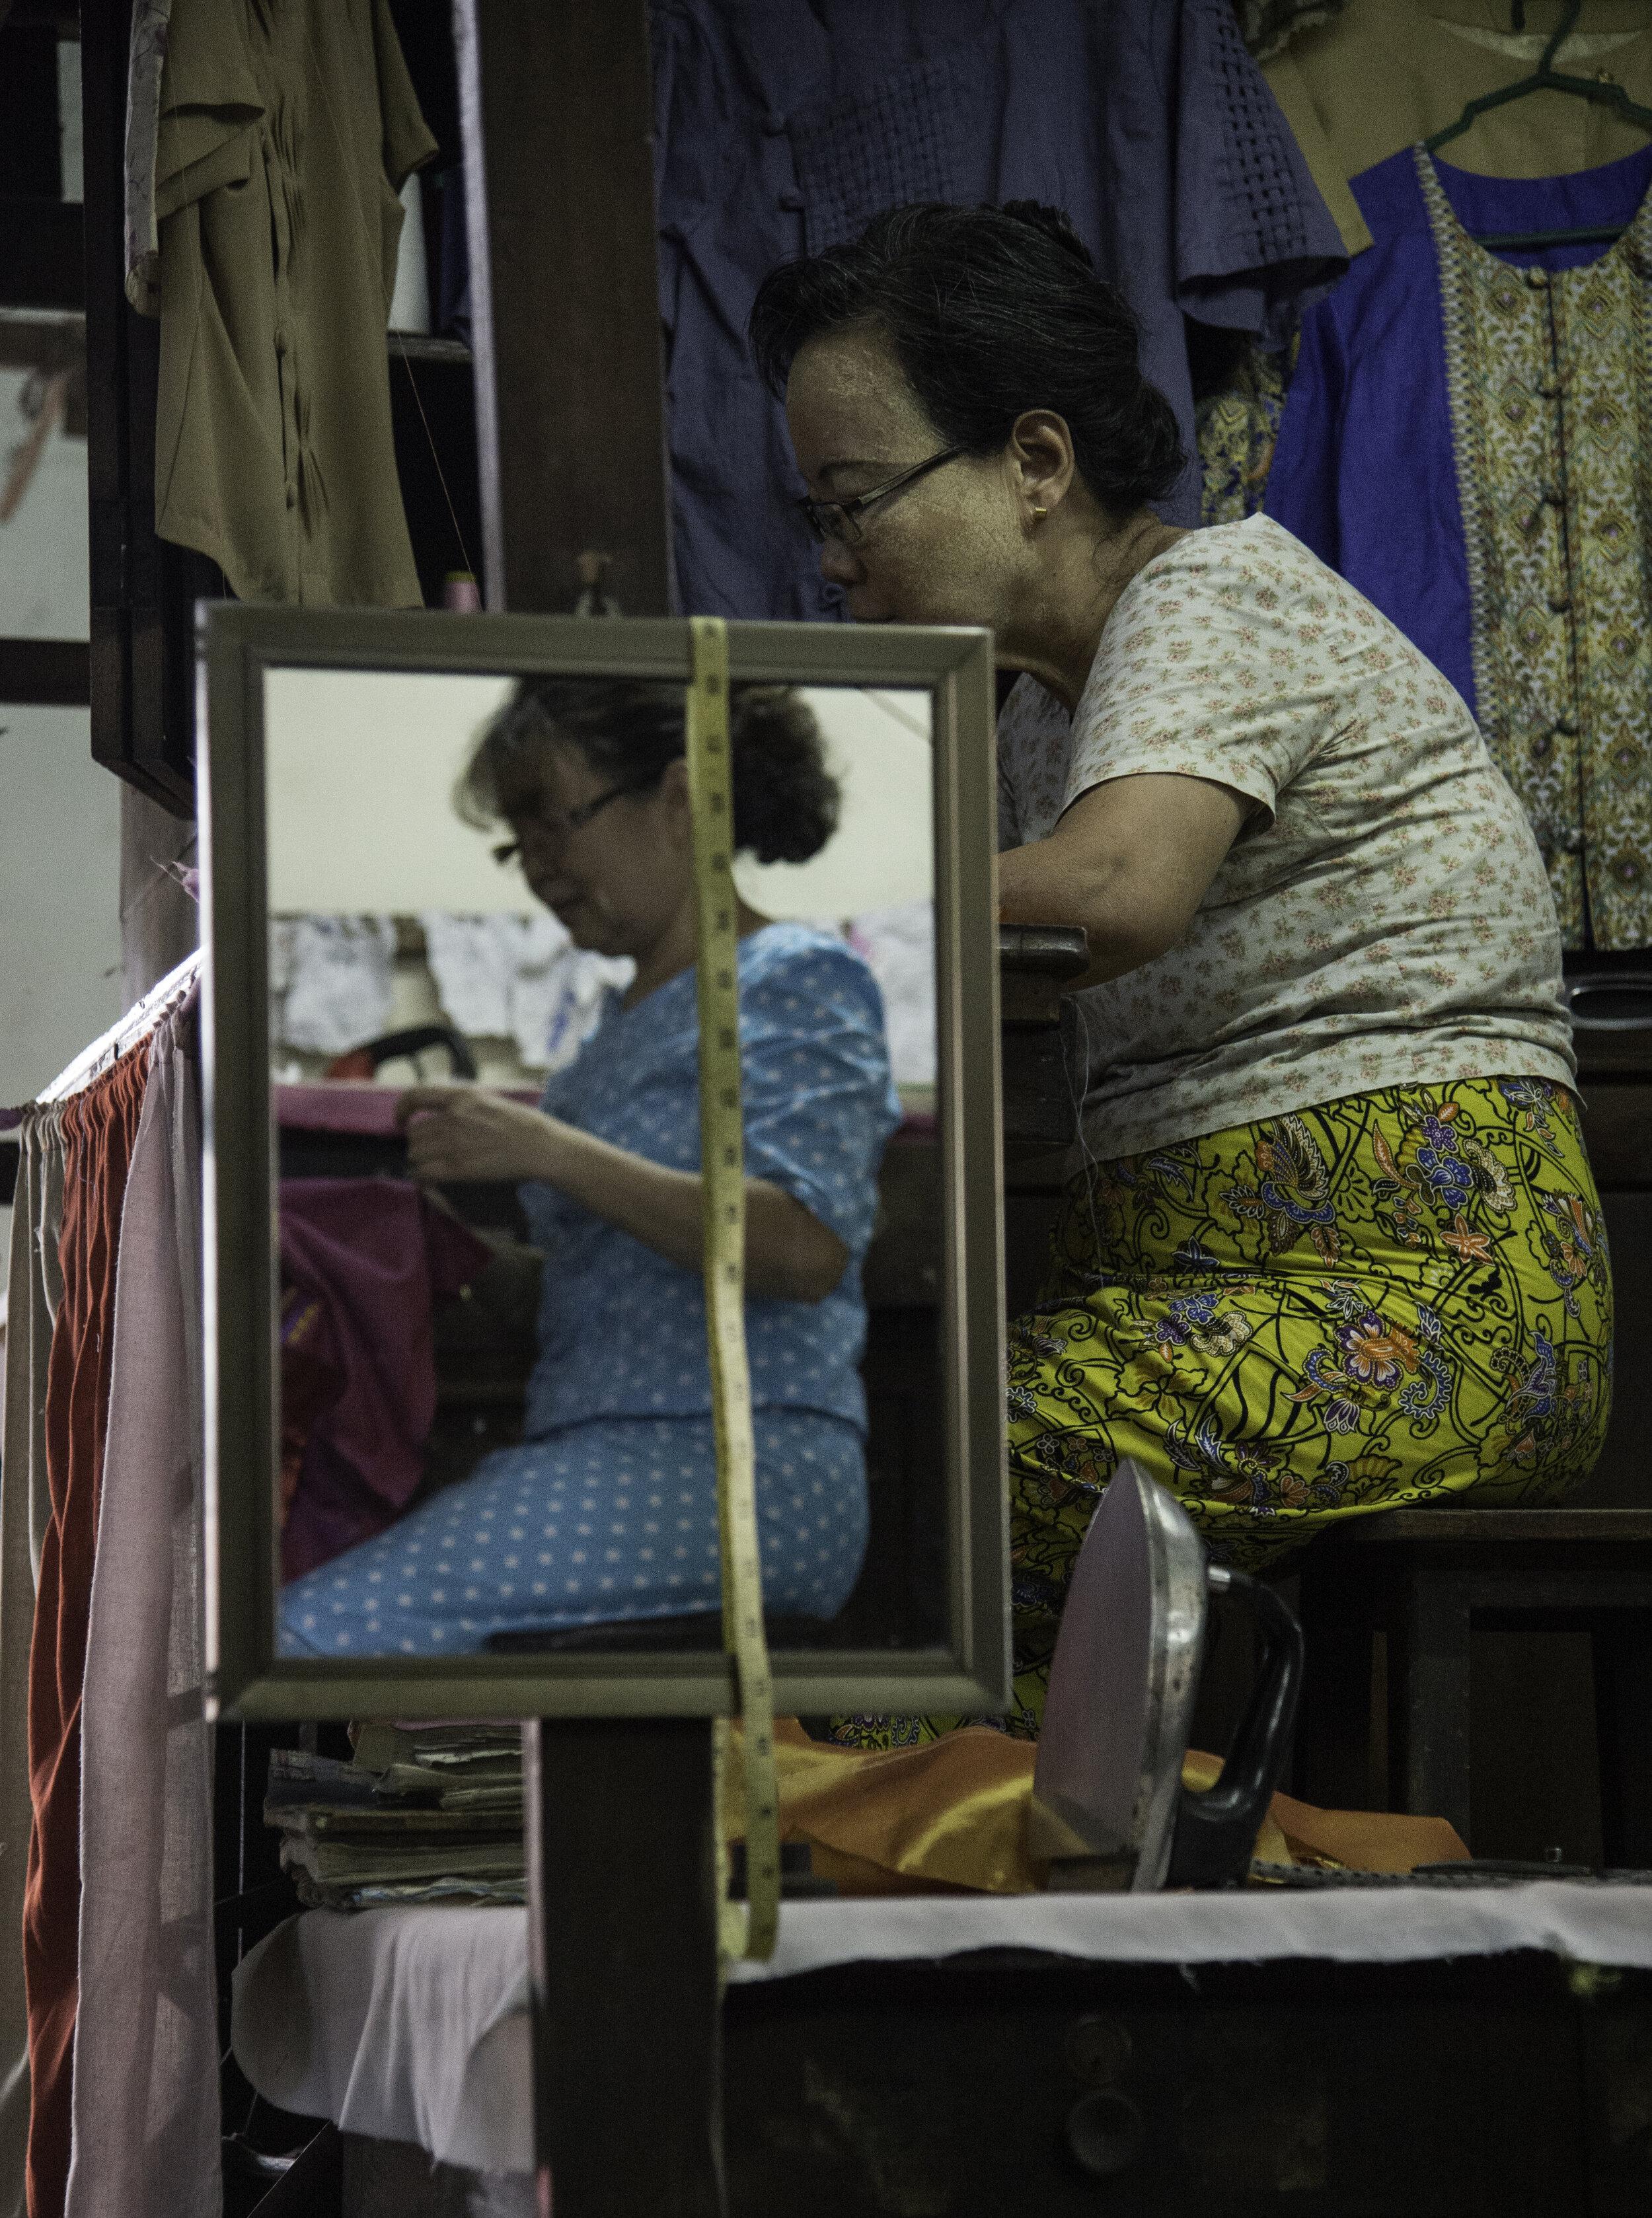 _17 Tailors, Yangon, Myanmar.jpg